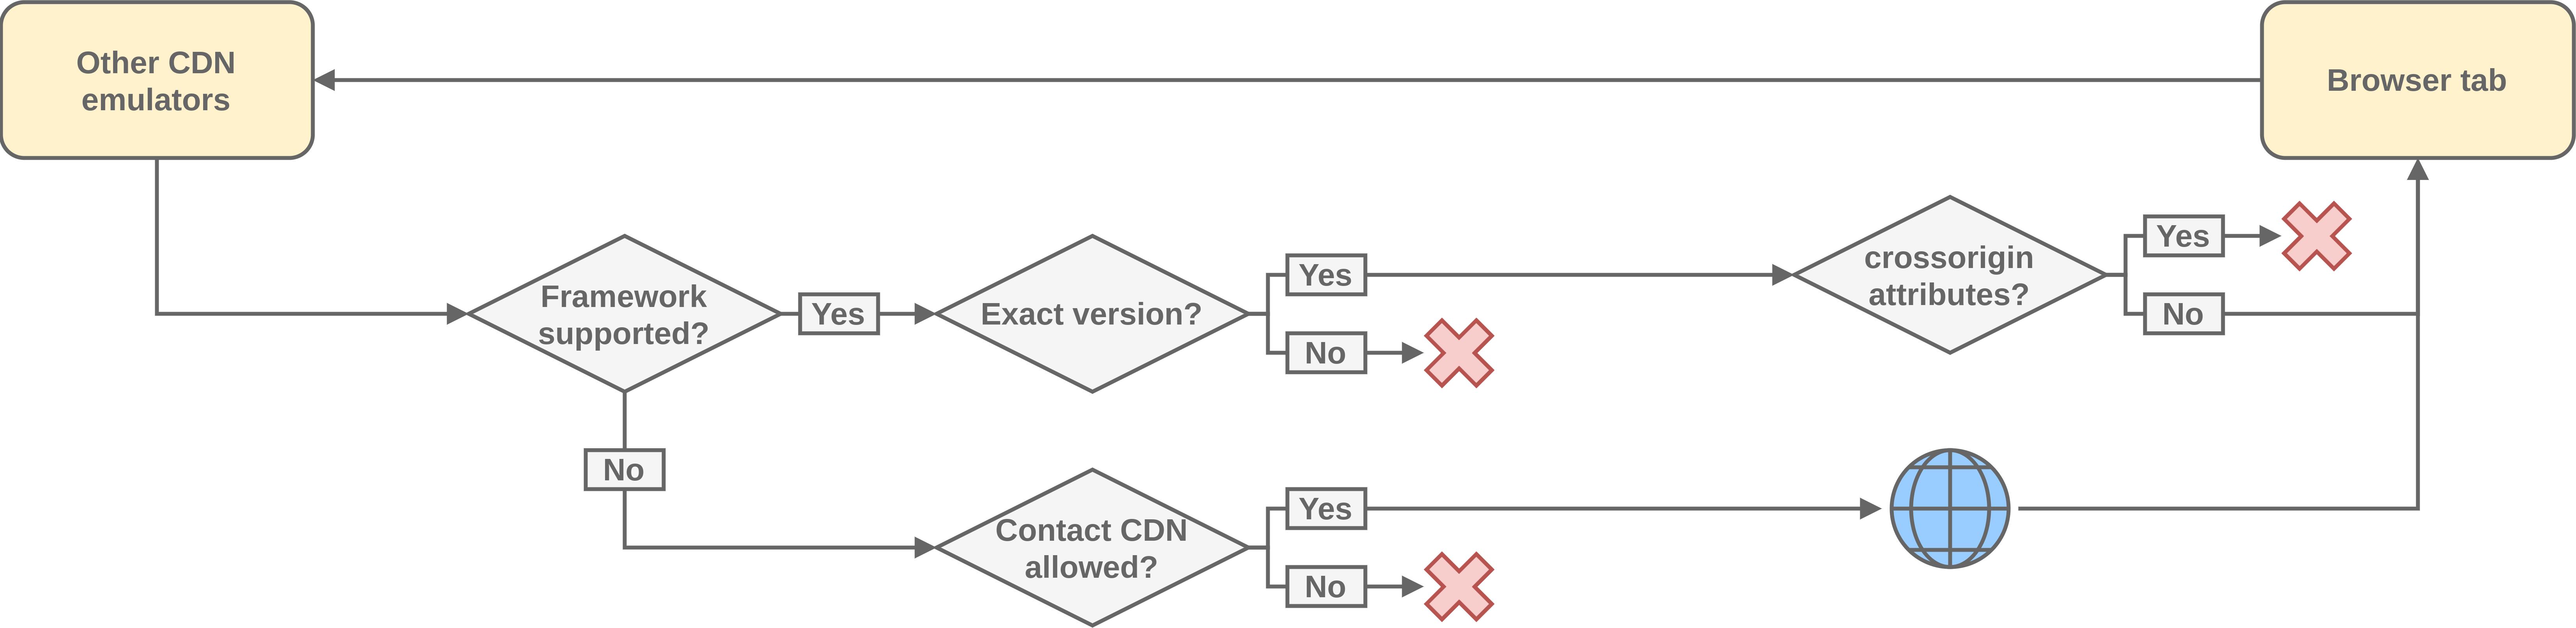 Other CDN emulators